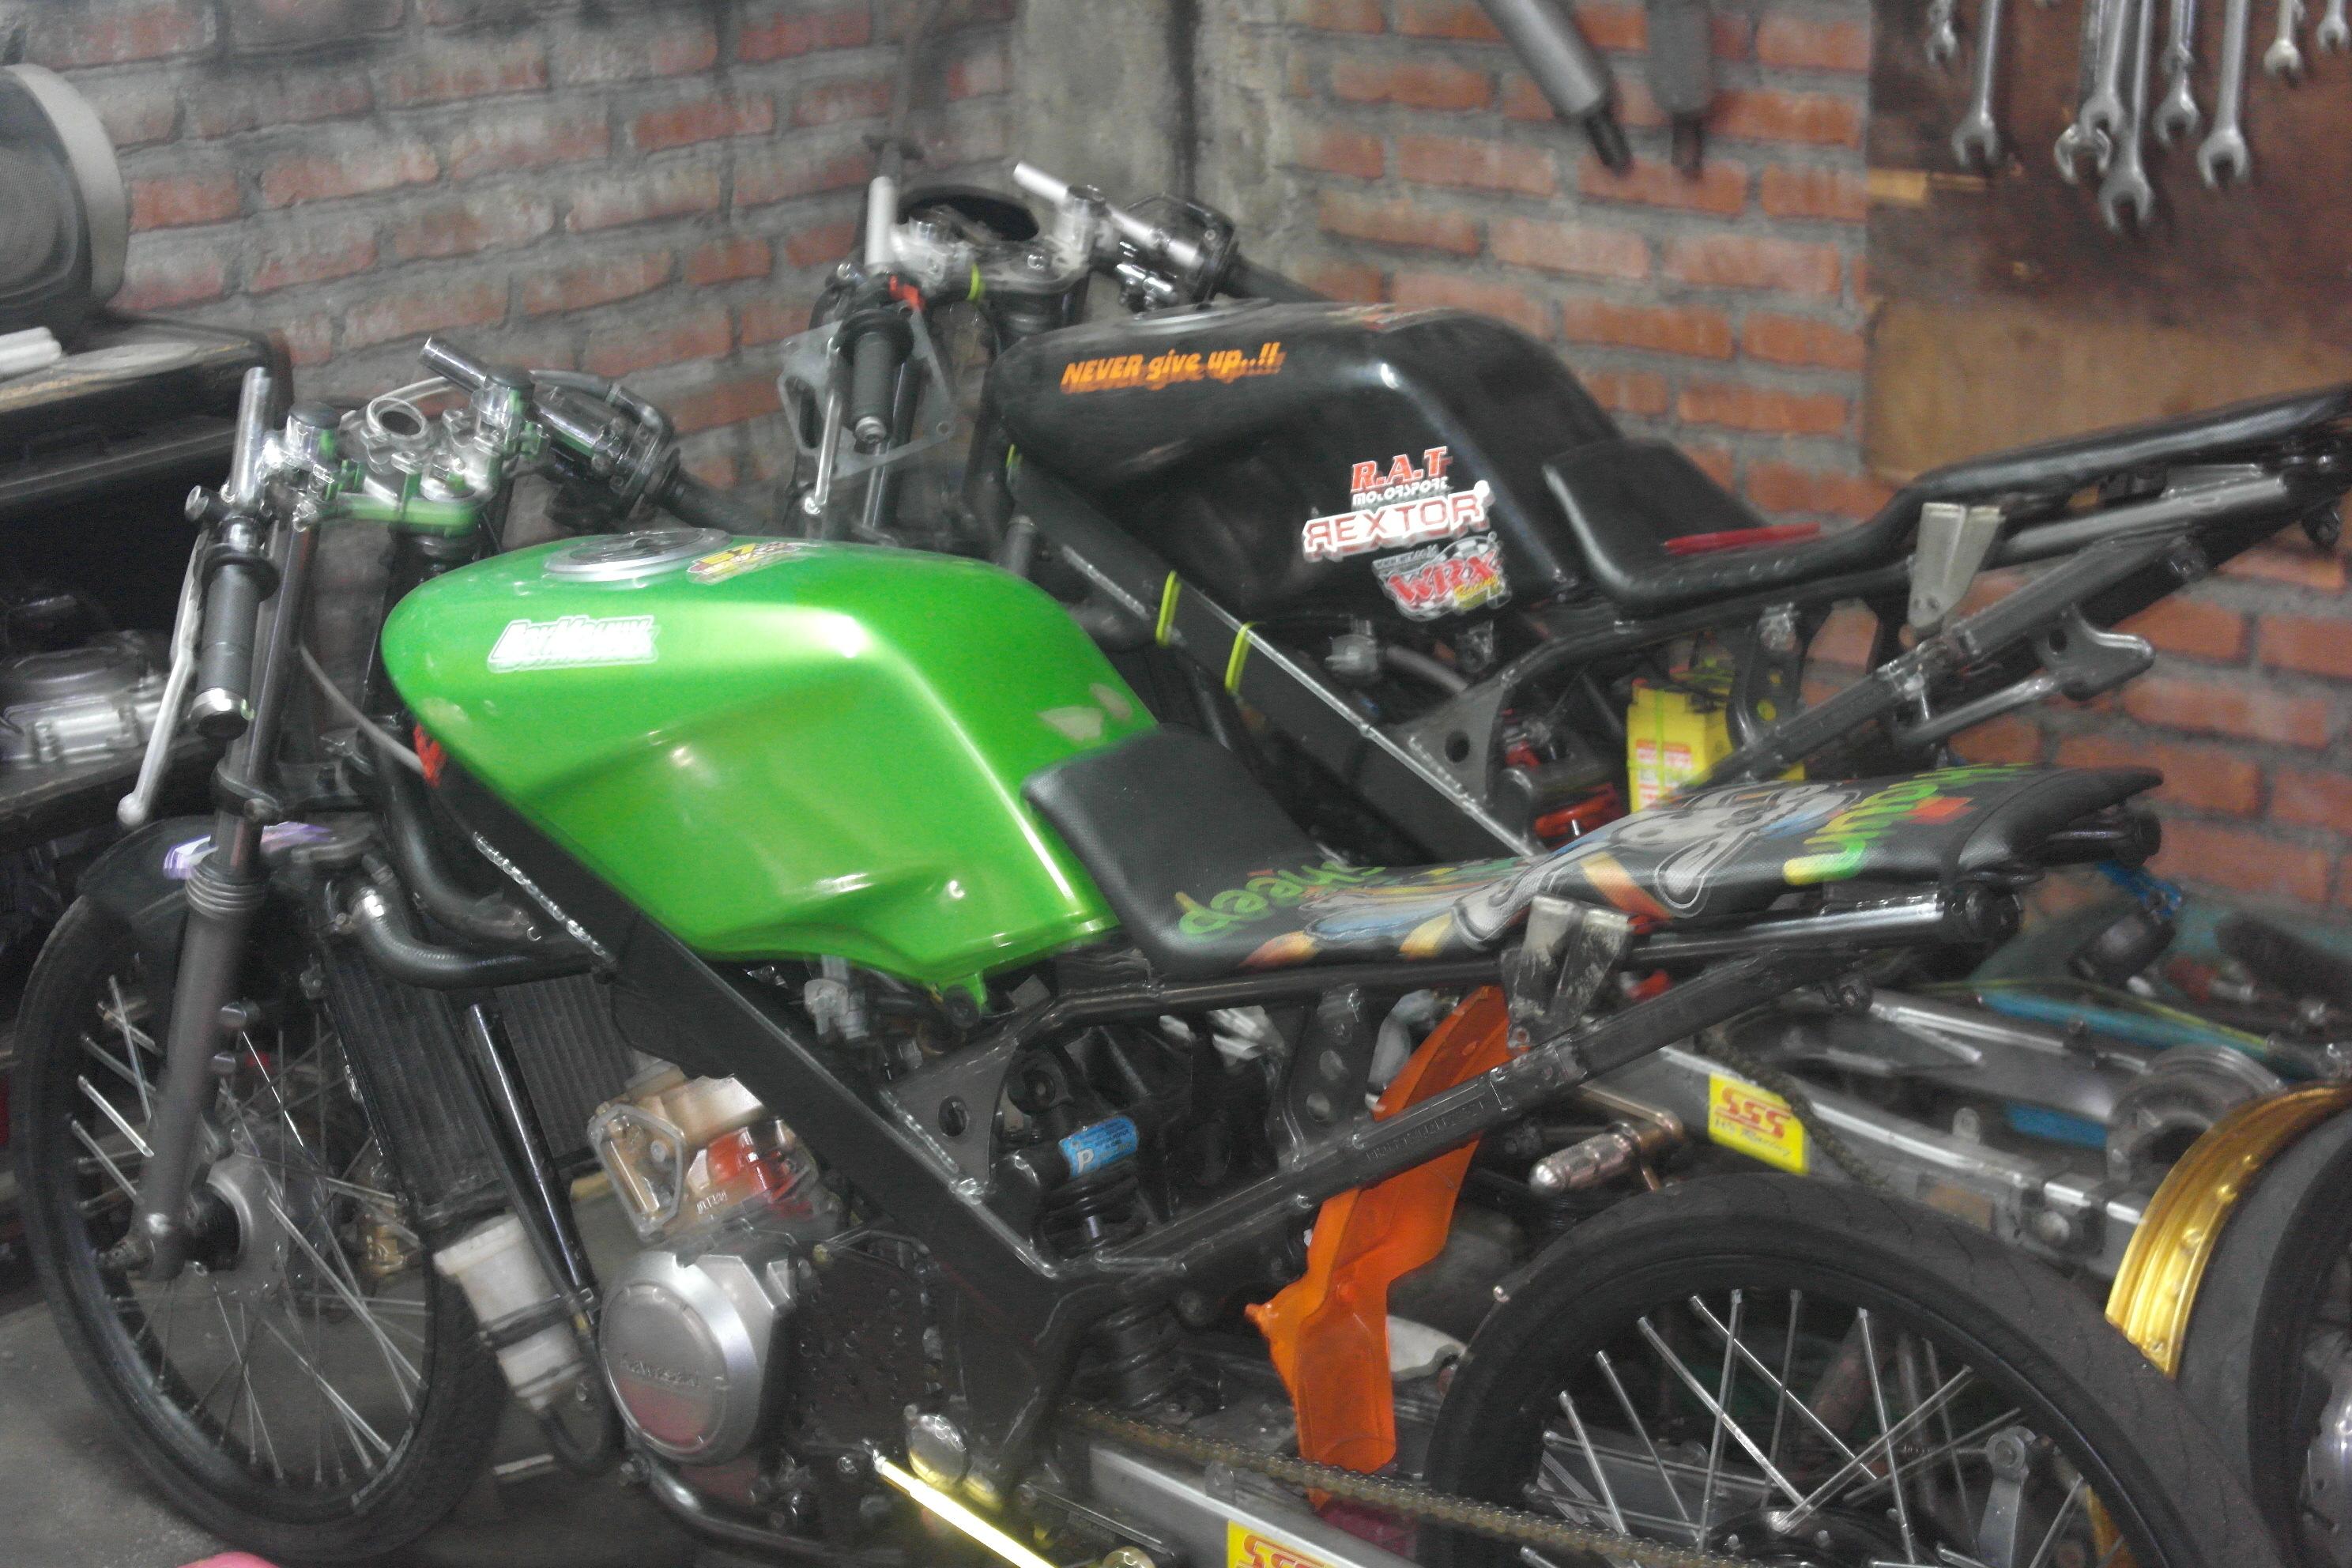 Foto ninja drag bike 50